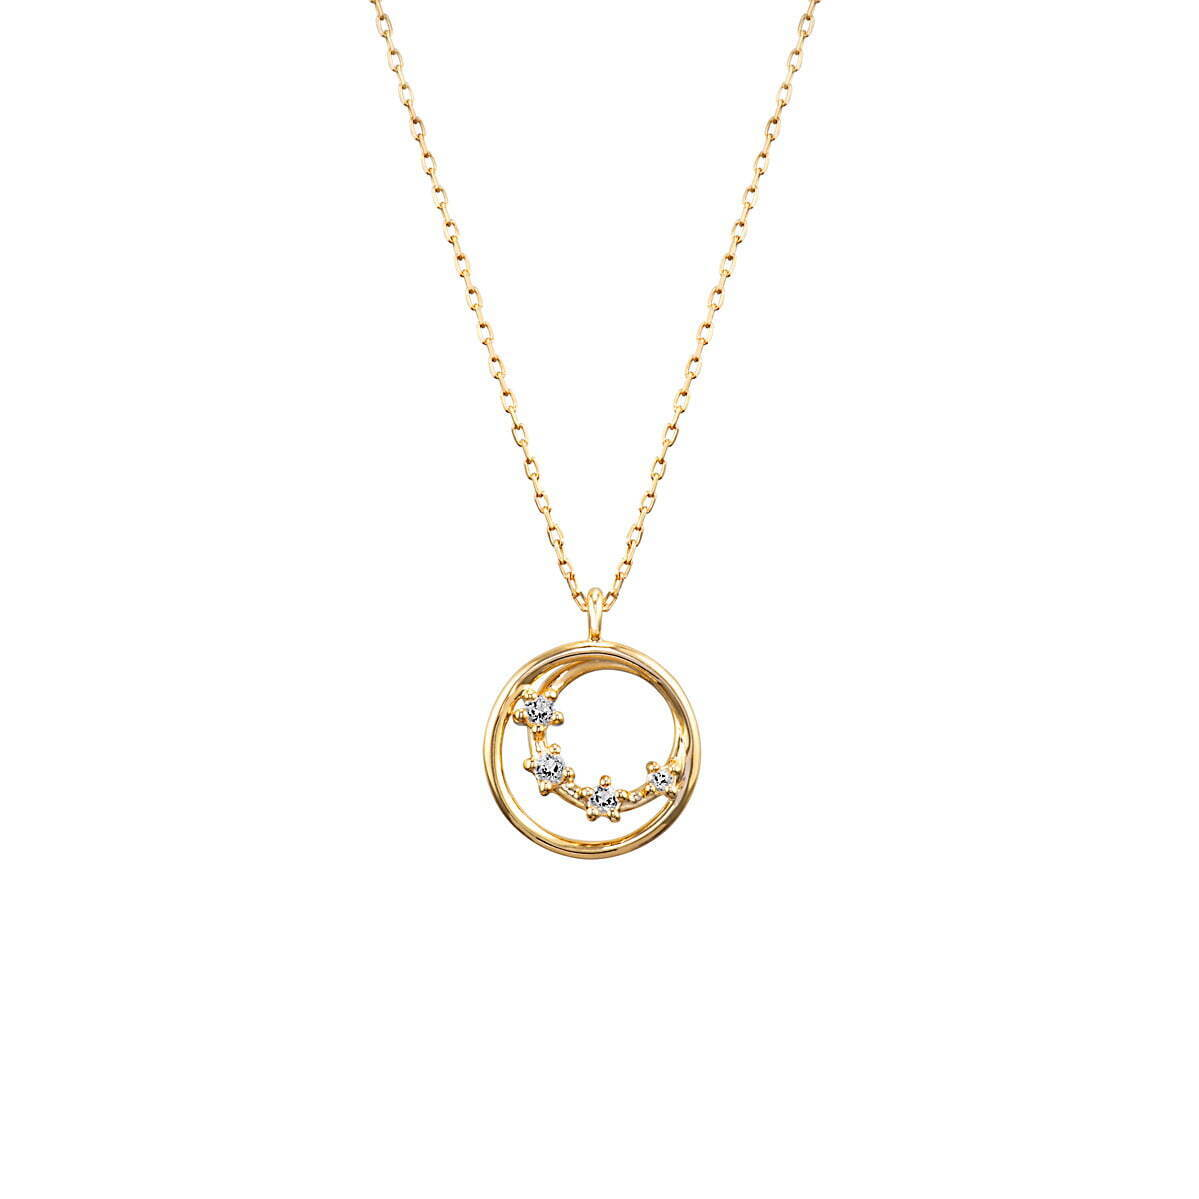 K10YG Necklace/Topaz 22,000円+税